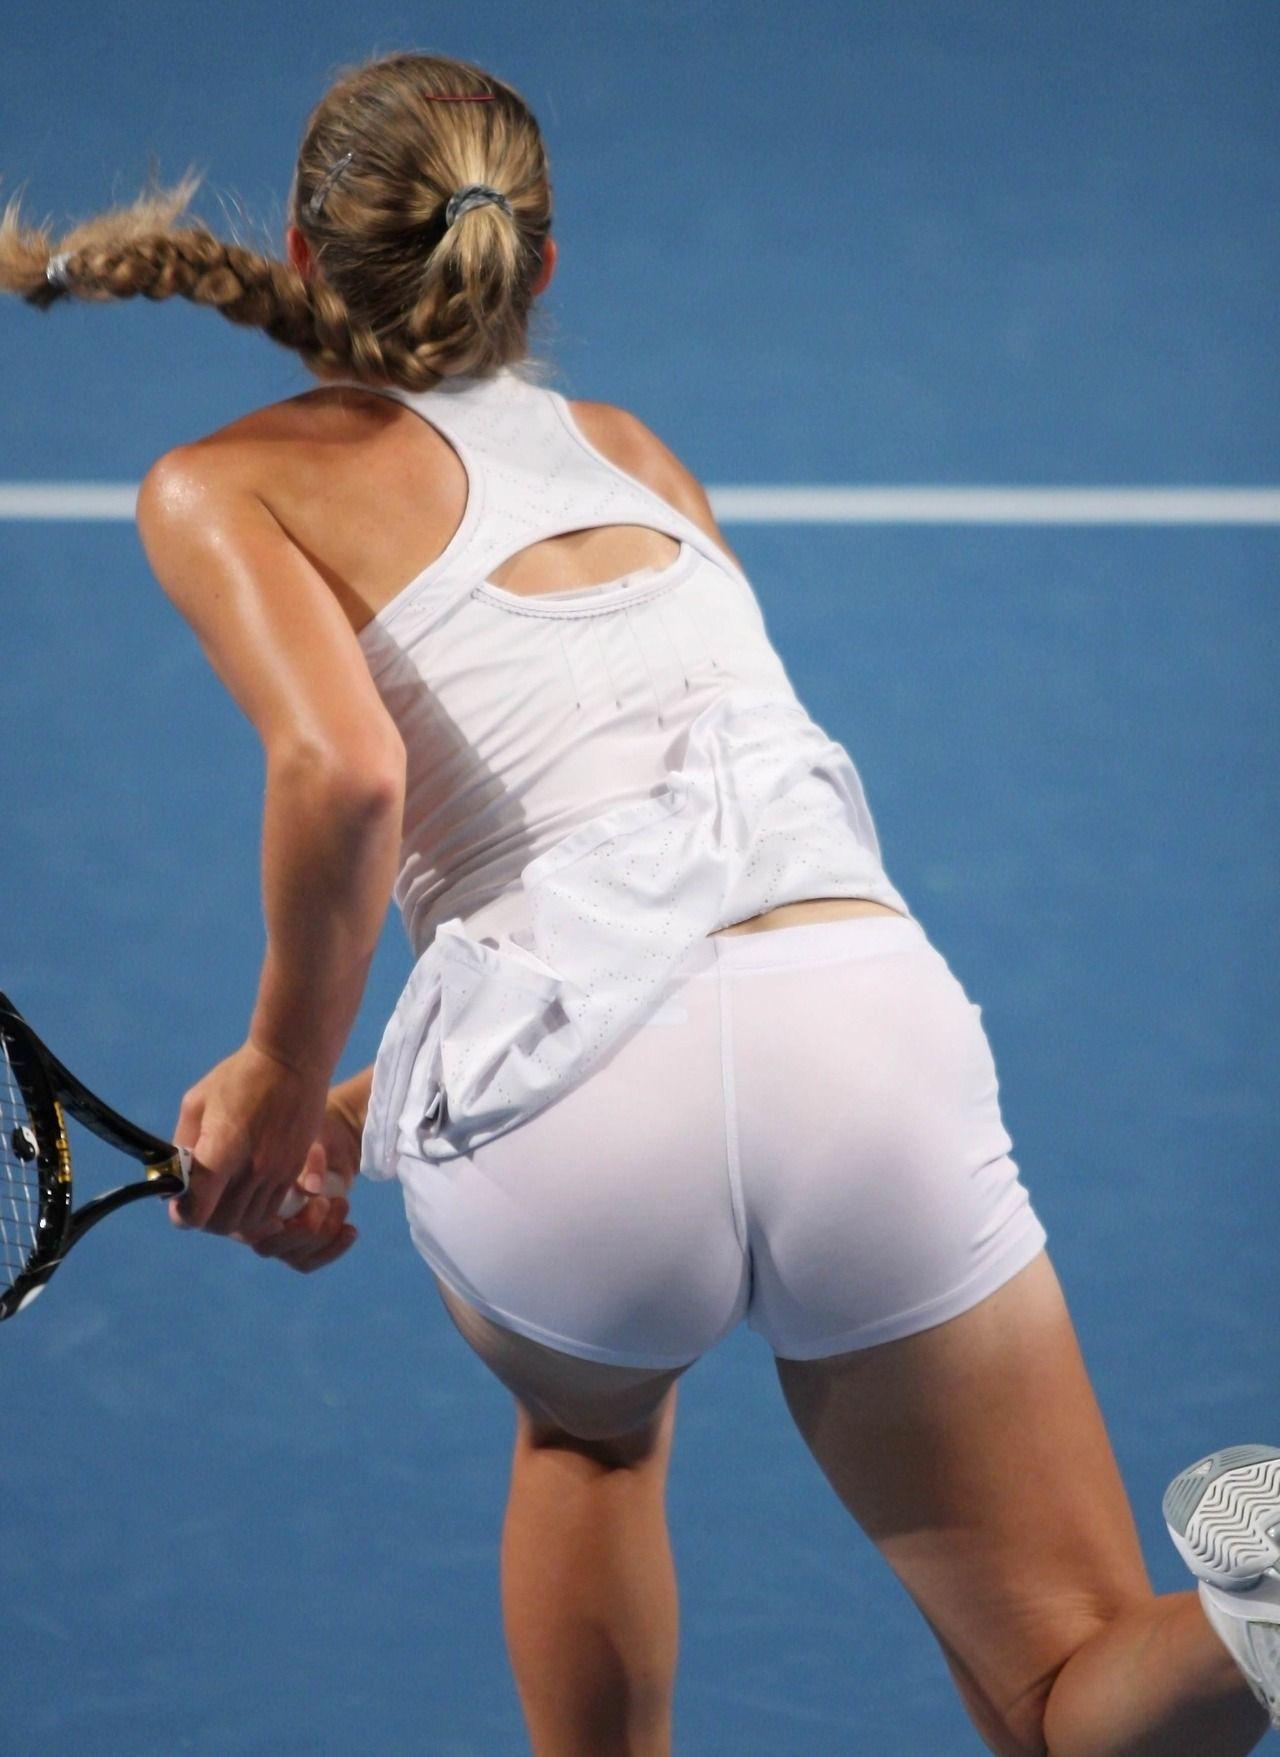 Female Athlete Babes: Anna Chakvetadze Has the Hot